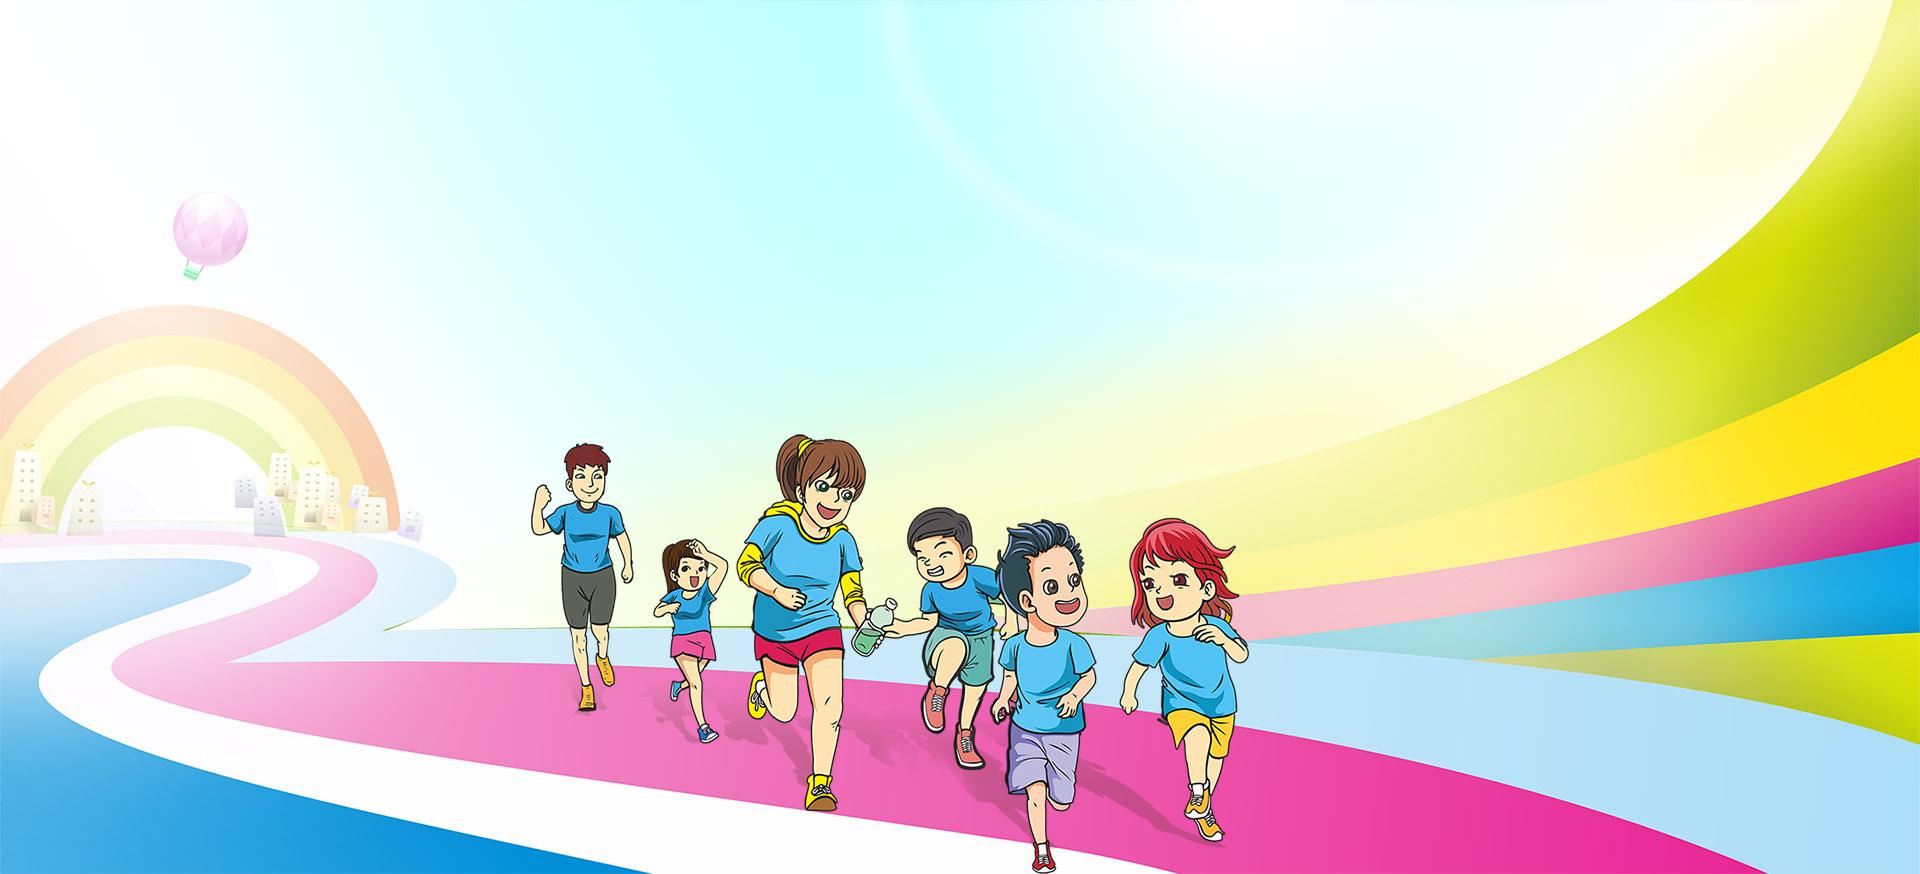 Картинки спортивного праздника для детей